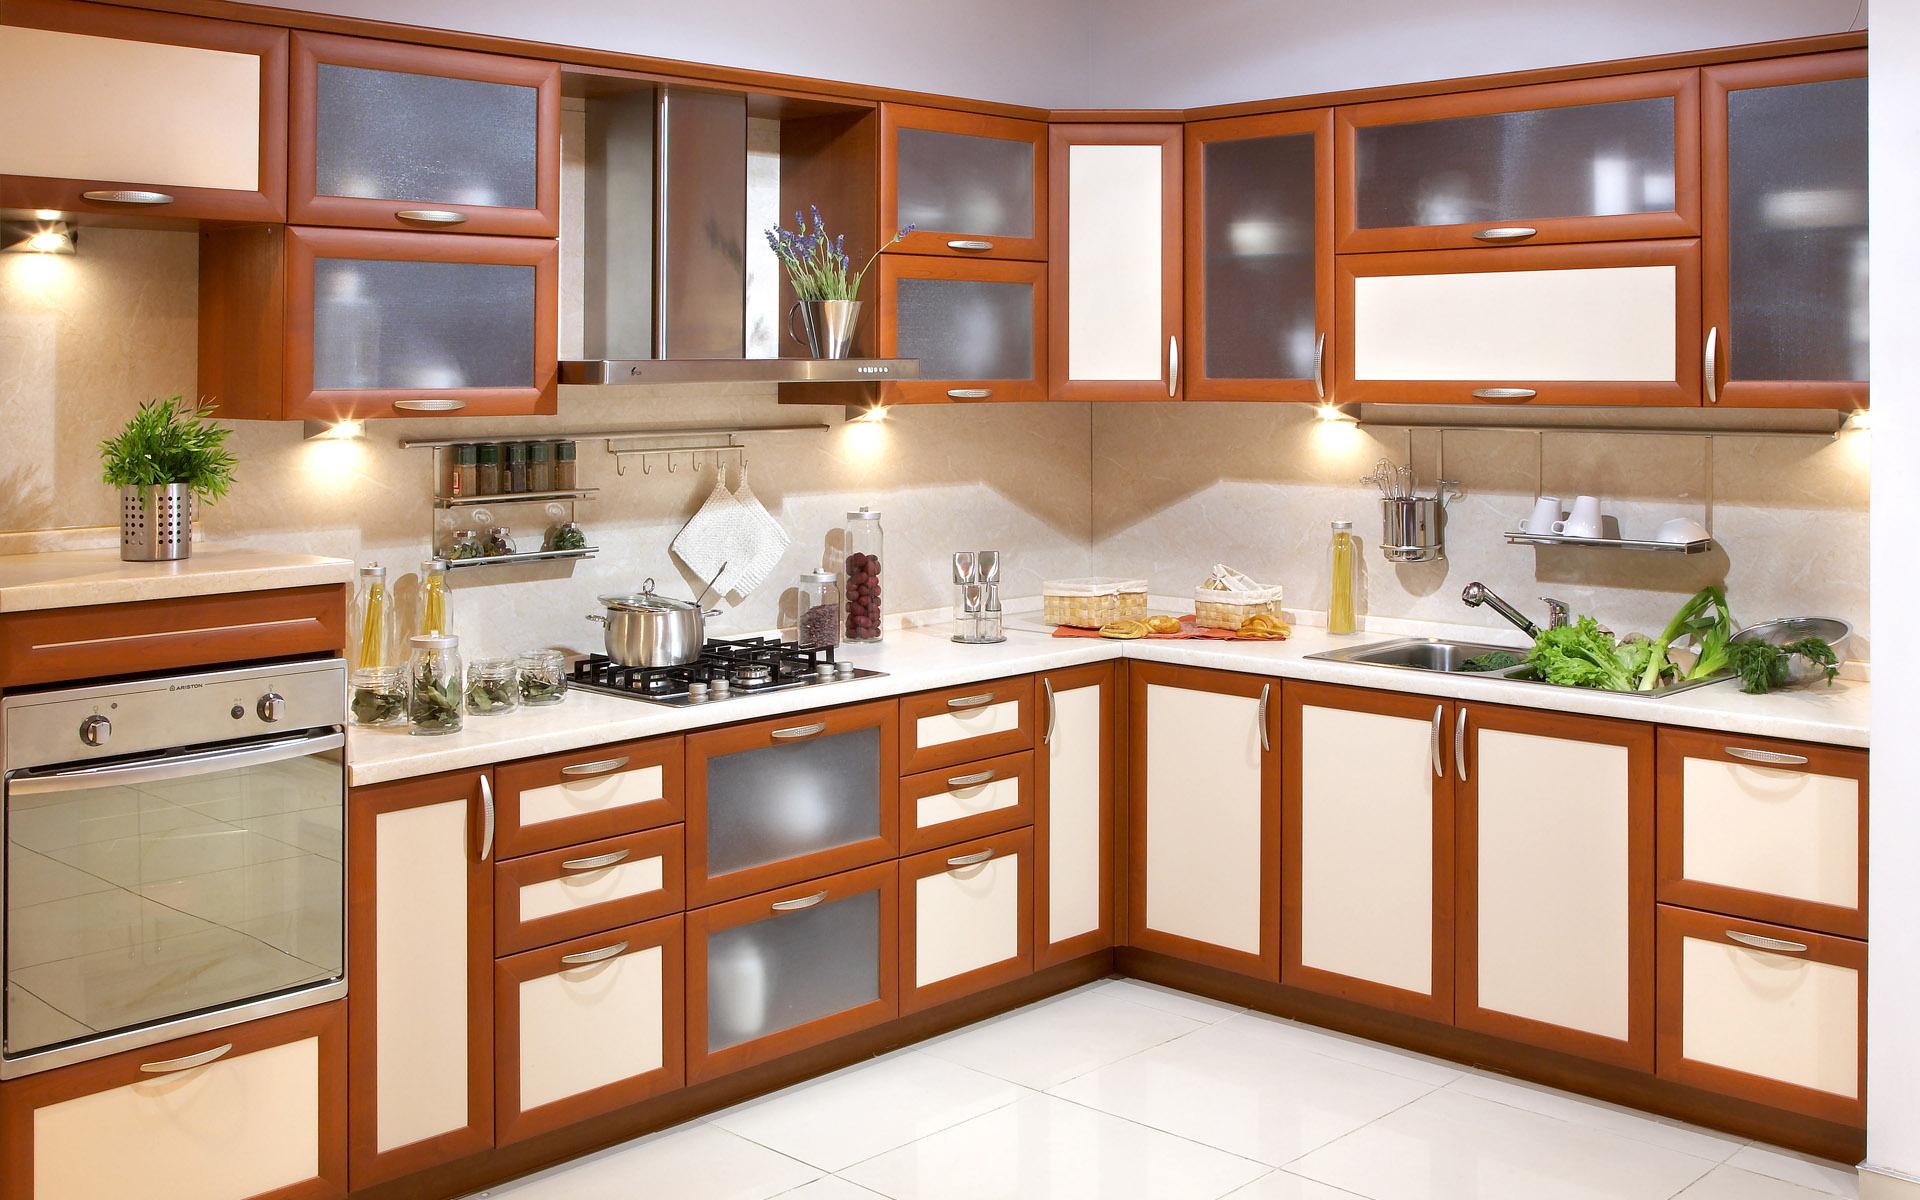 Kitchen Desktop Wallpaper 62684